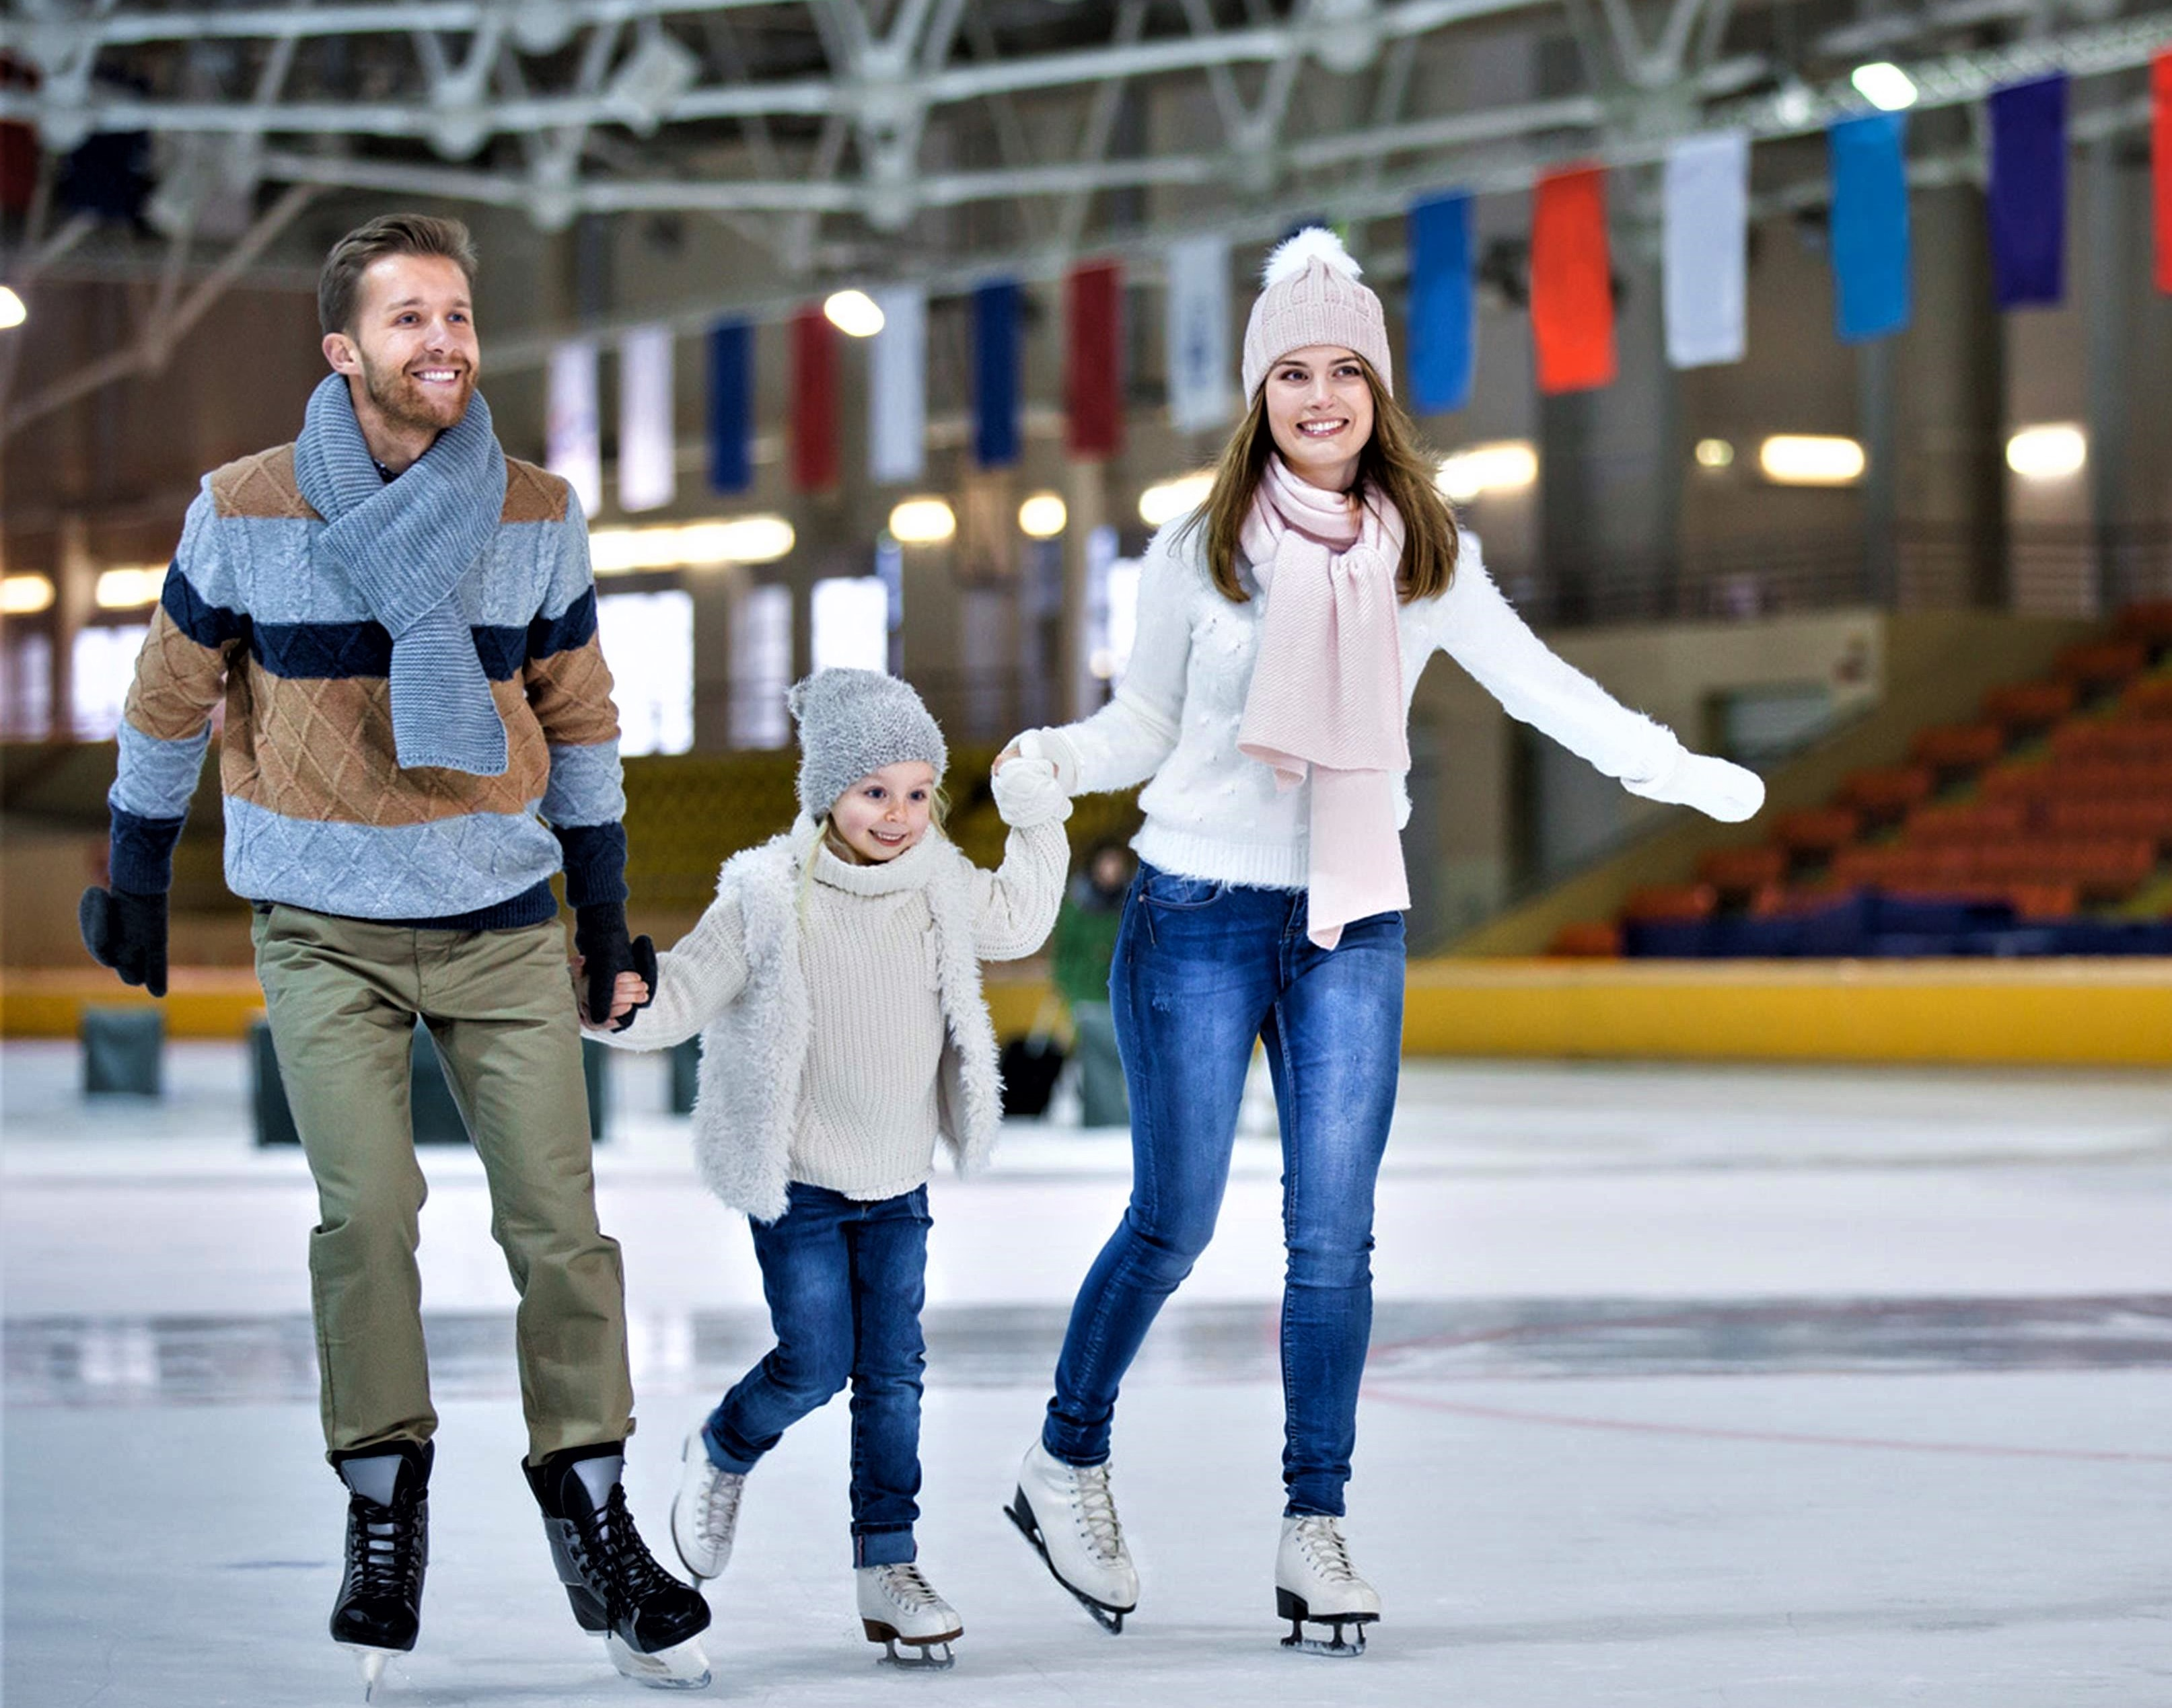 Мастер-класс катания на коньках